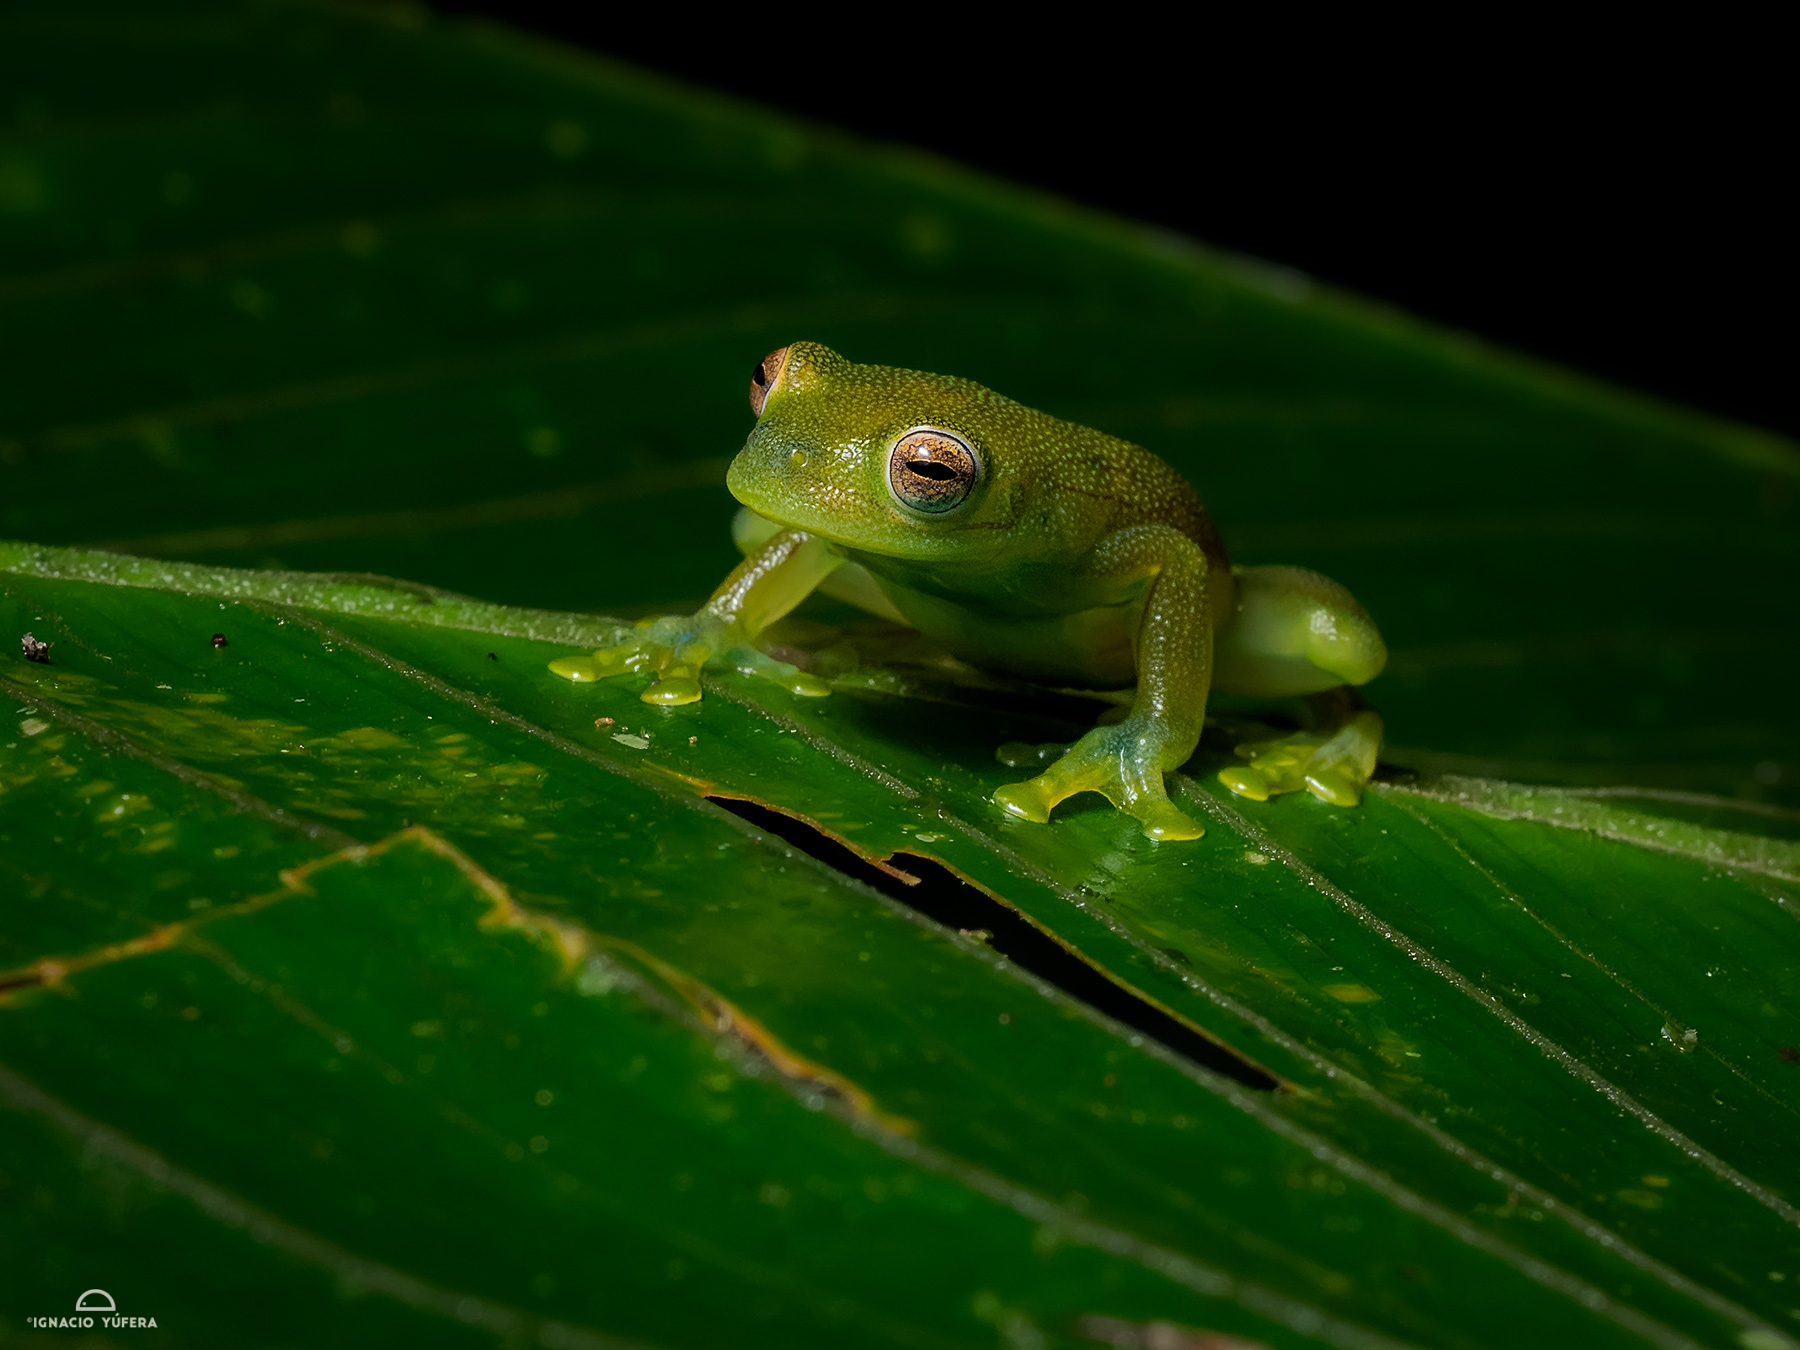 Granular Glass Frog (Cochranella granulosa), Fortuna, Panama, July